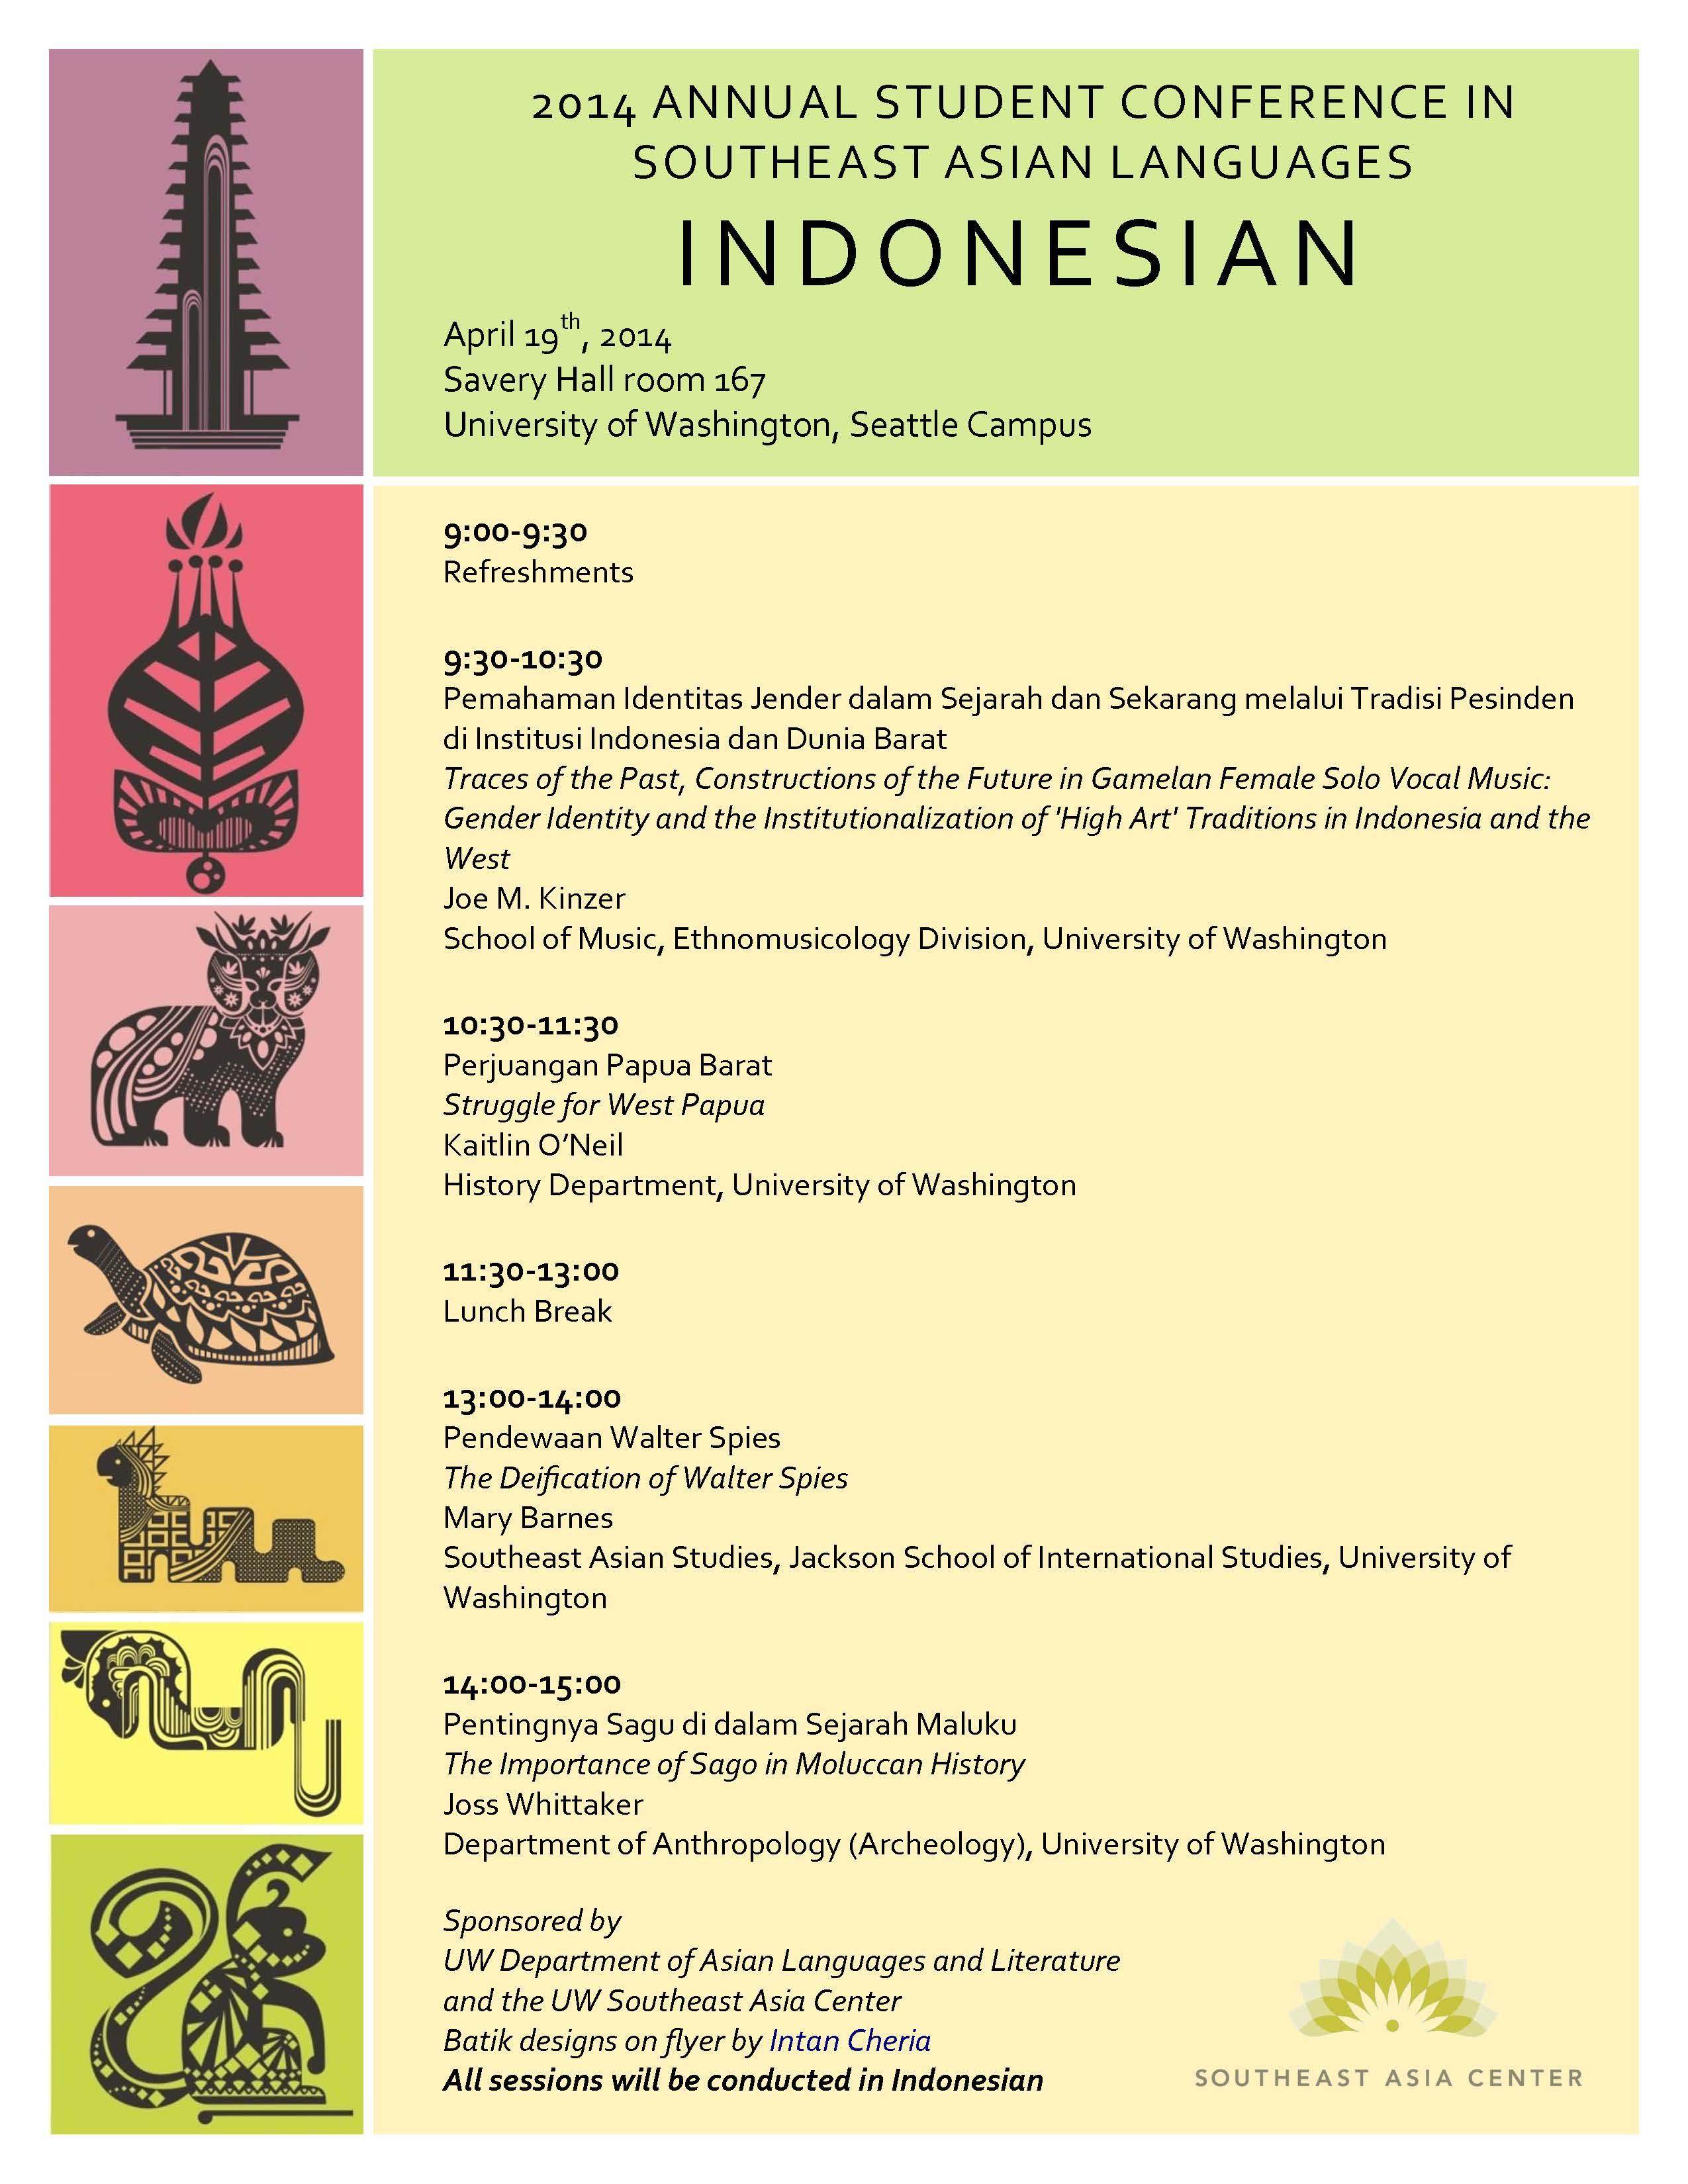 Southeast Asian Languages Southeast Asian Languages